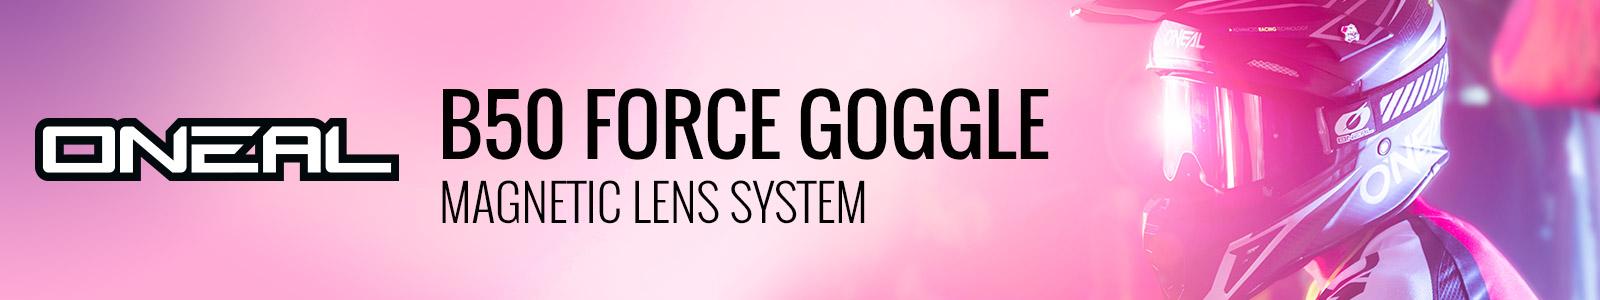 O'Neal B50 Force Goggle